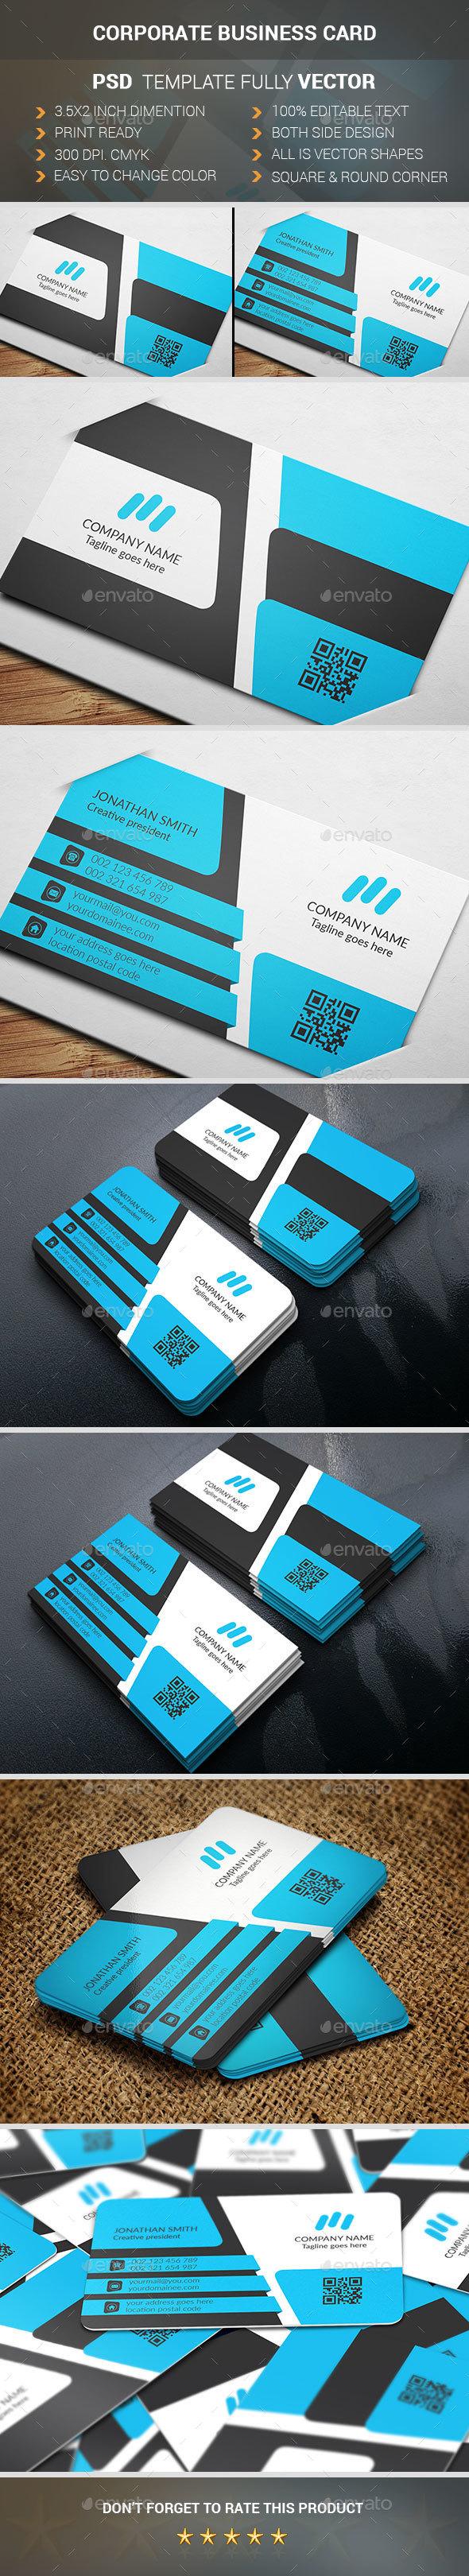 Corporate Busniess Card - Corporate Business Cards